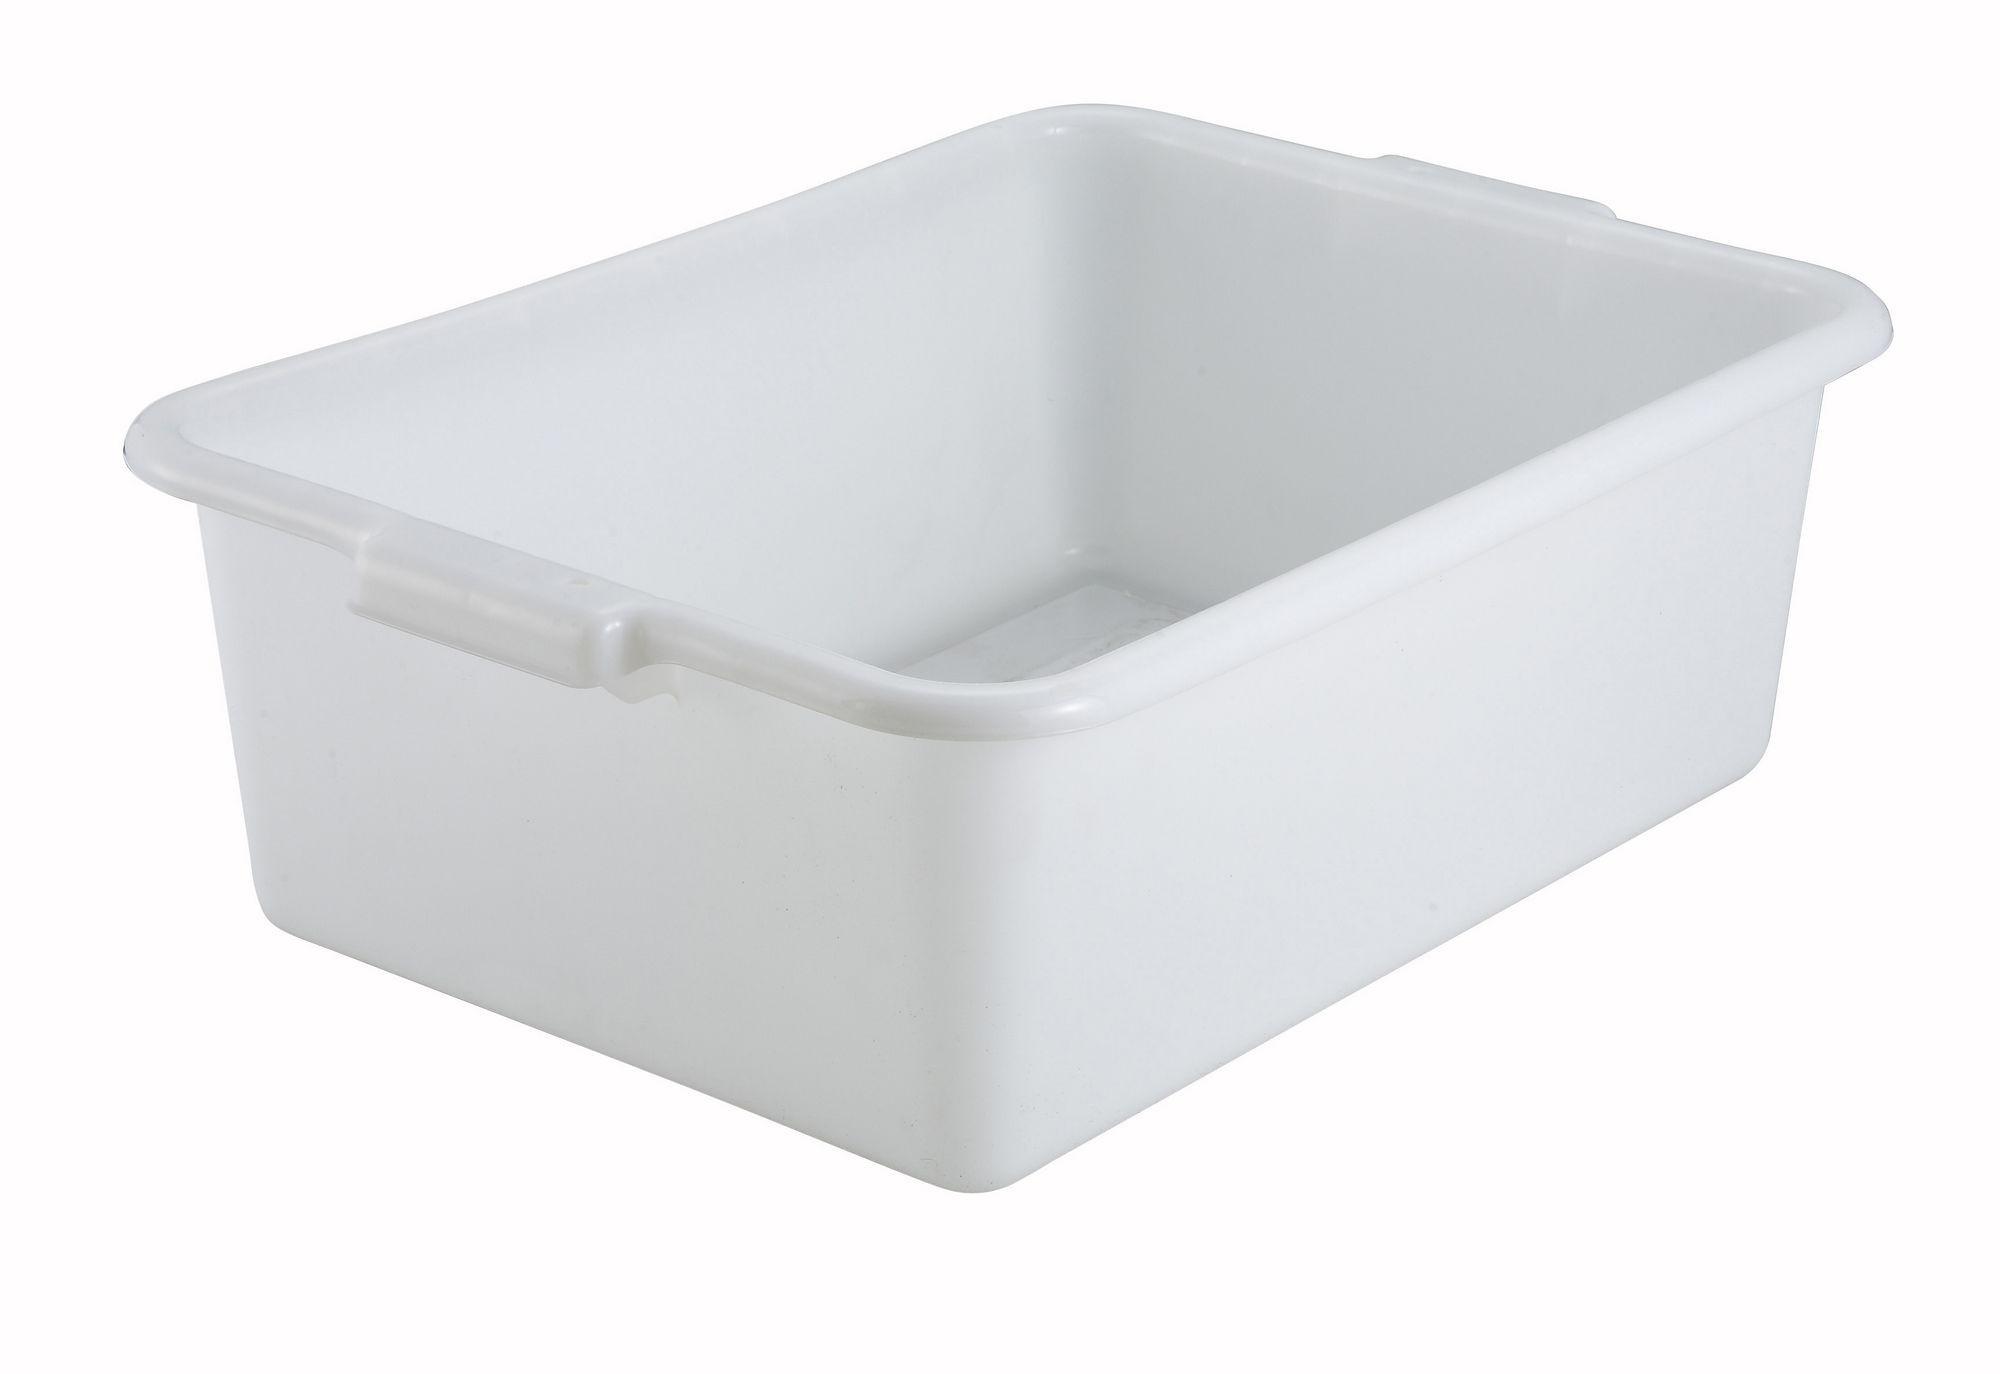 "Winco PL-7W White Dish Box 20-1/4"" x 15-1/2"" x 7"""